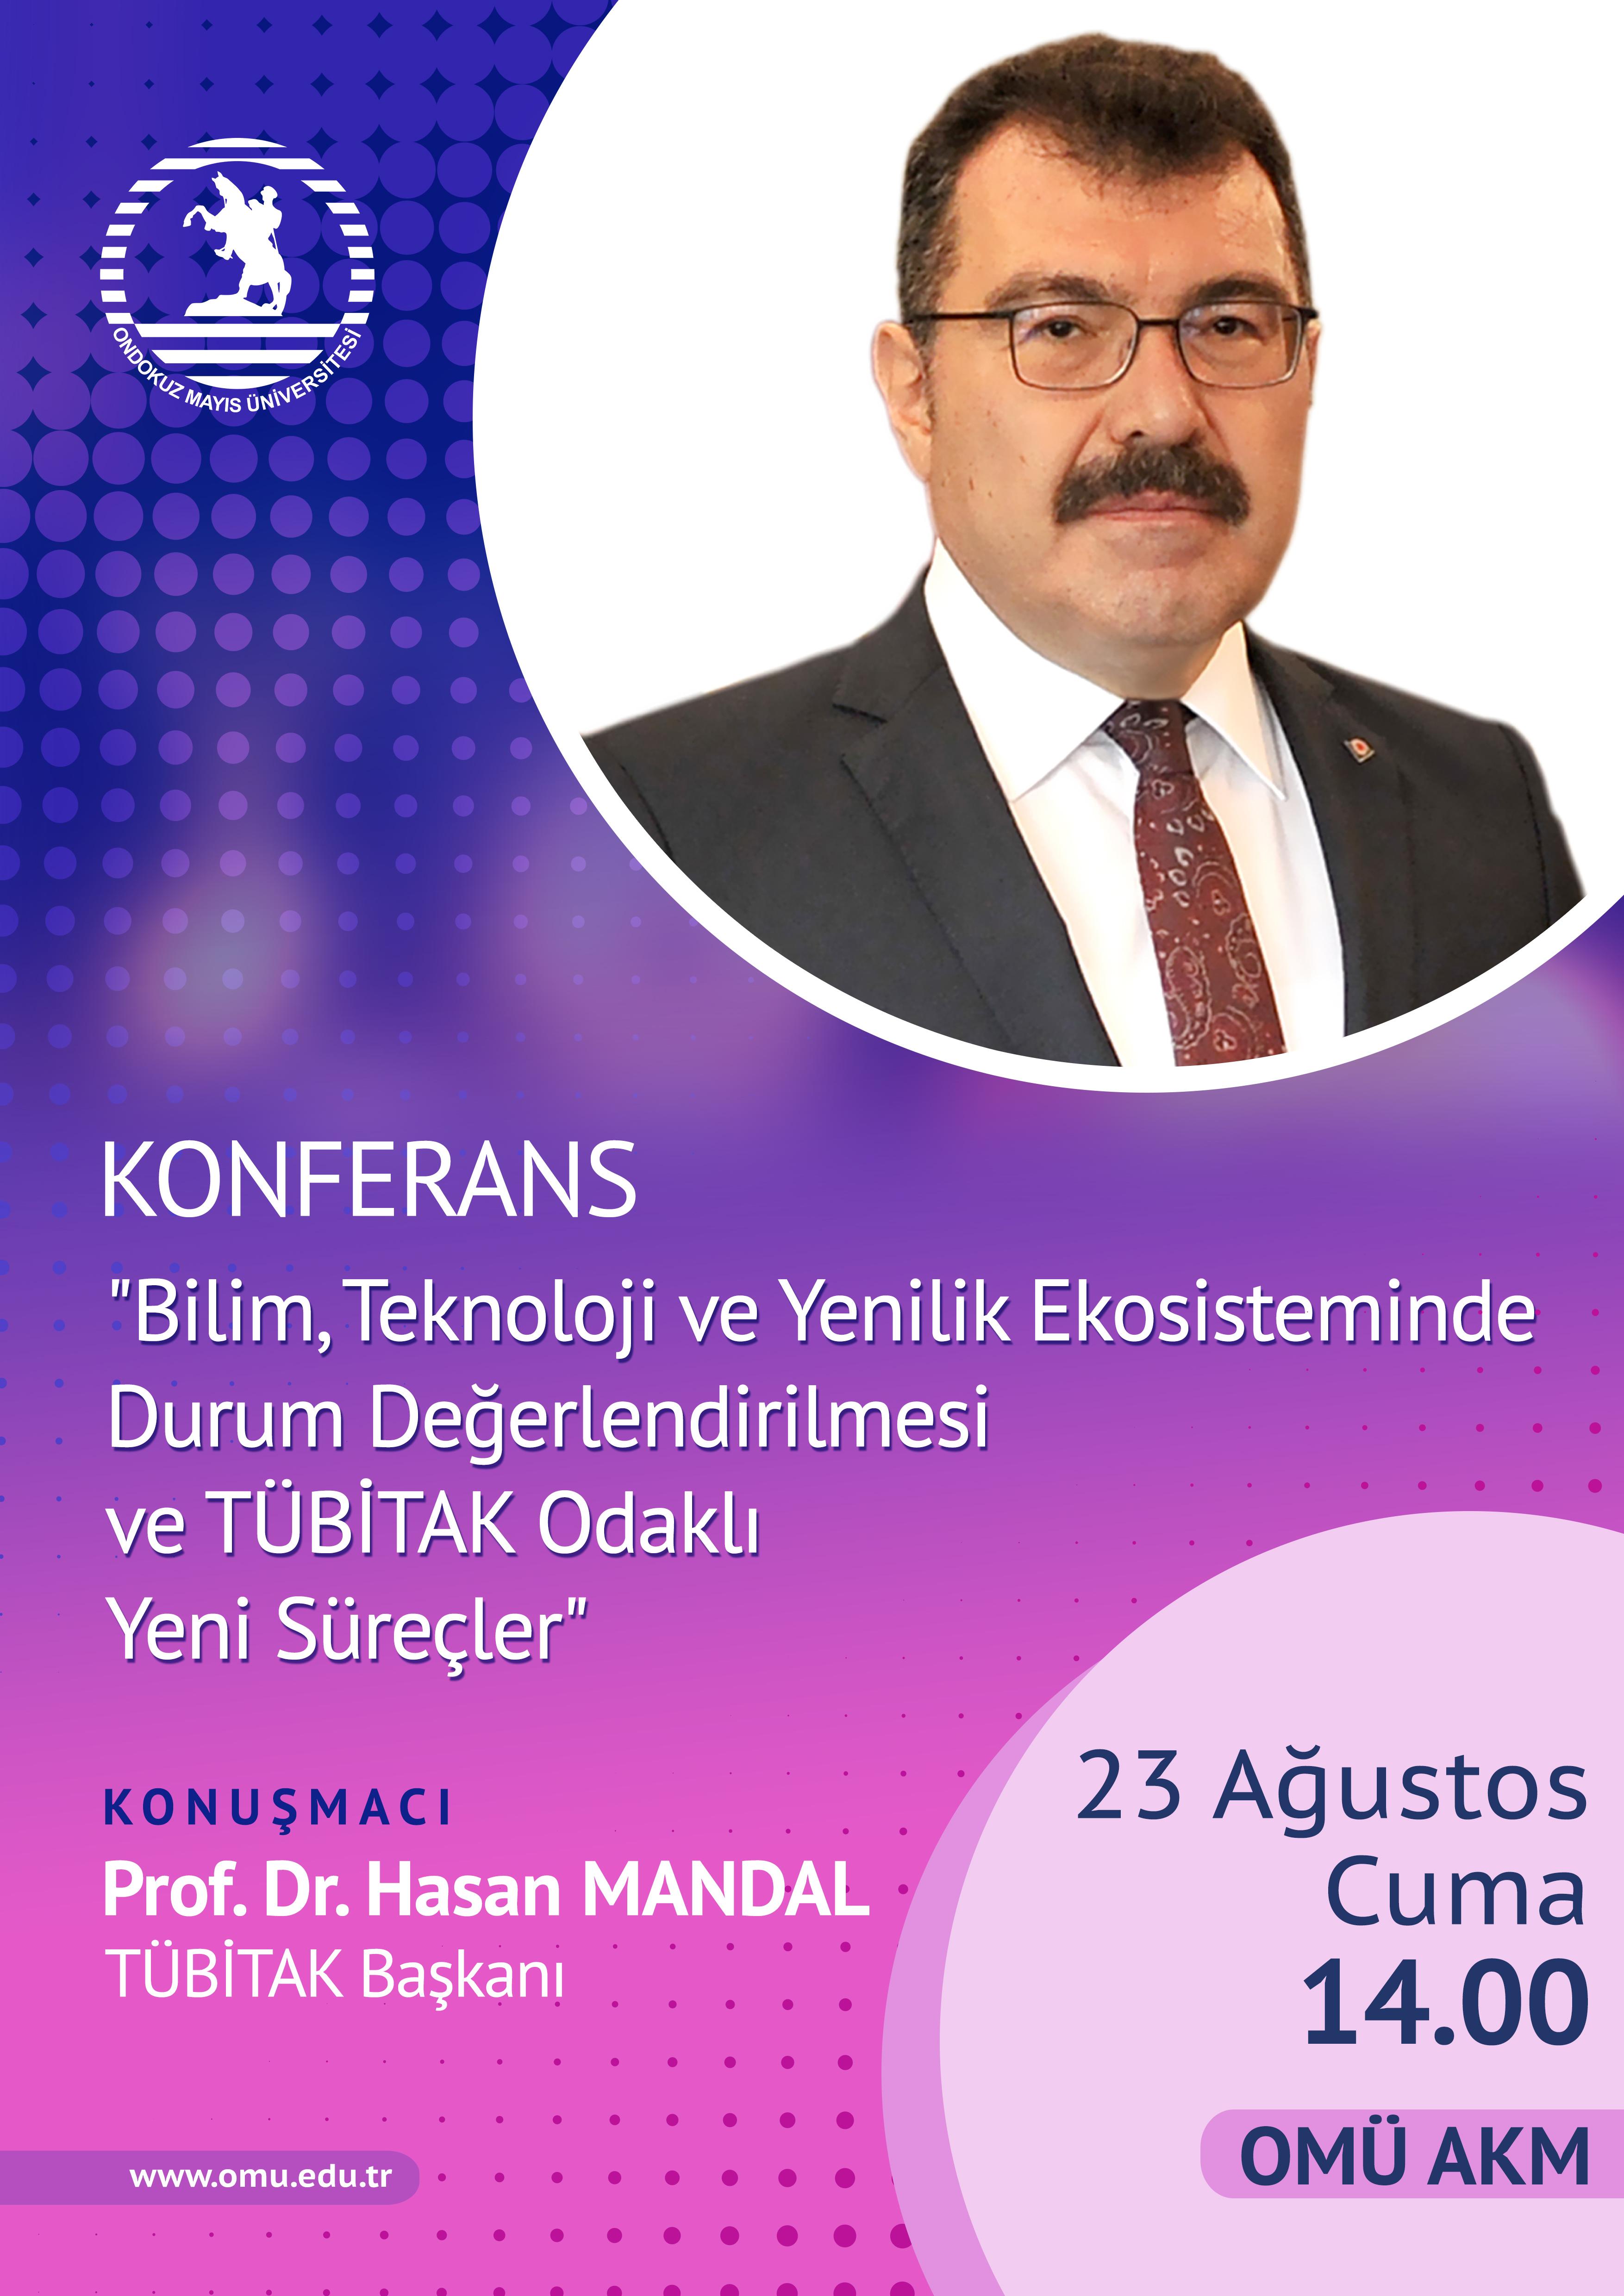 http://www.omu.edu.tr/sites/default/files/omu_tubitak_baskani_hasan_mandal_01.jpg